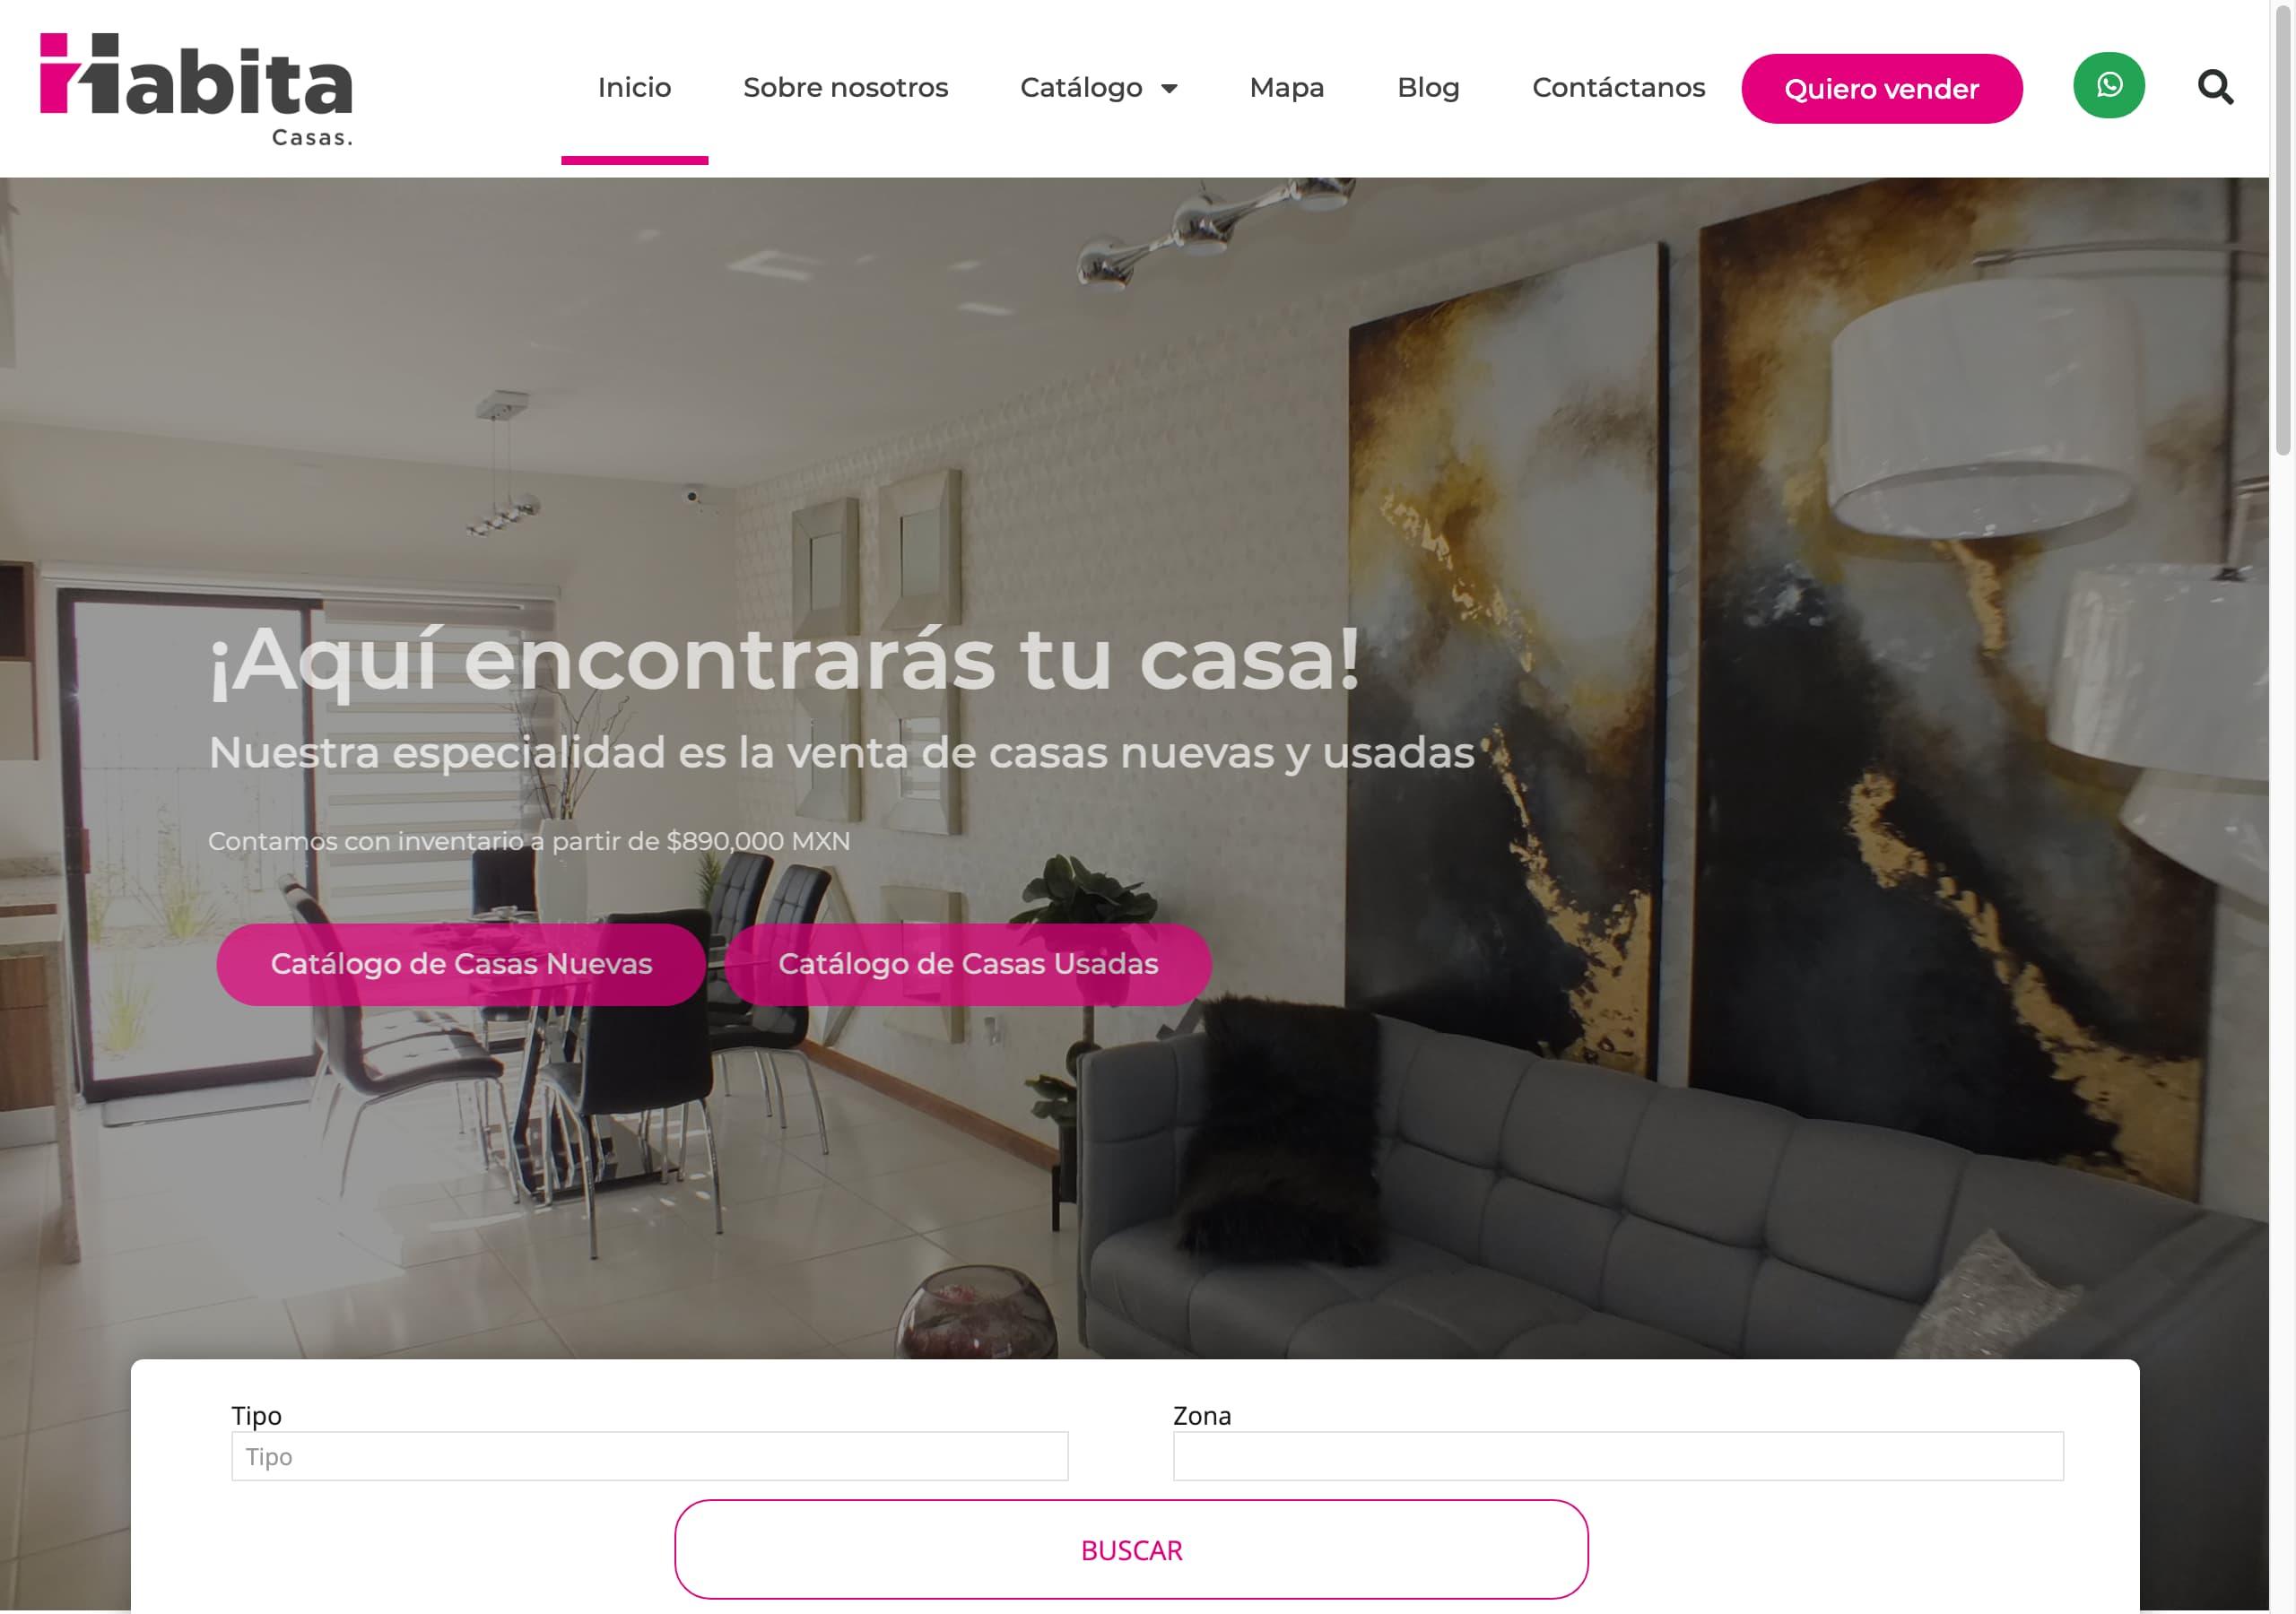 habitacasas.com.mx